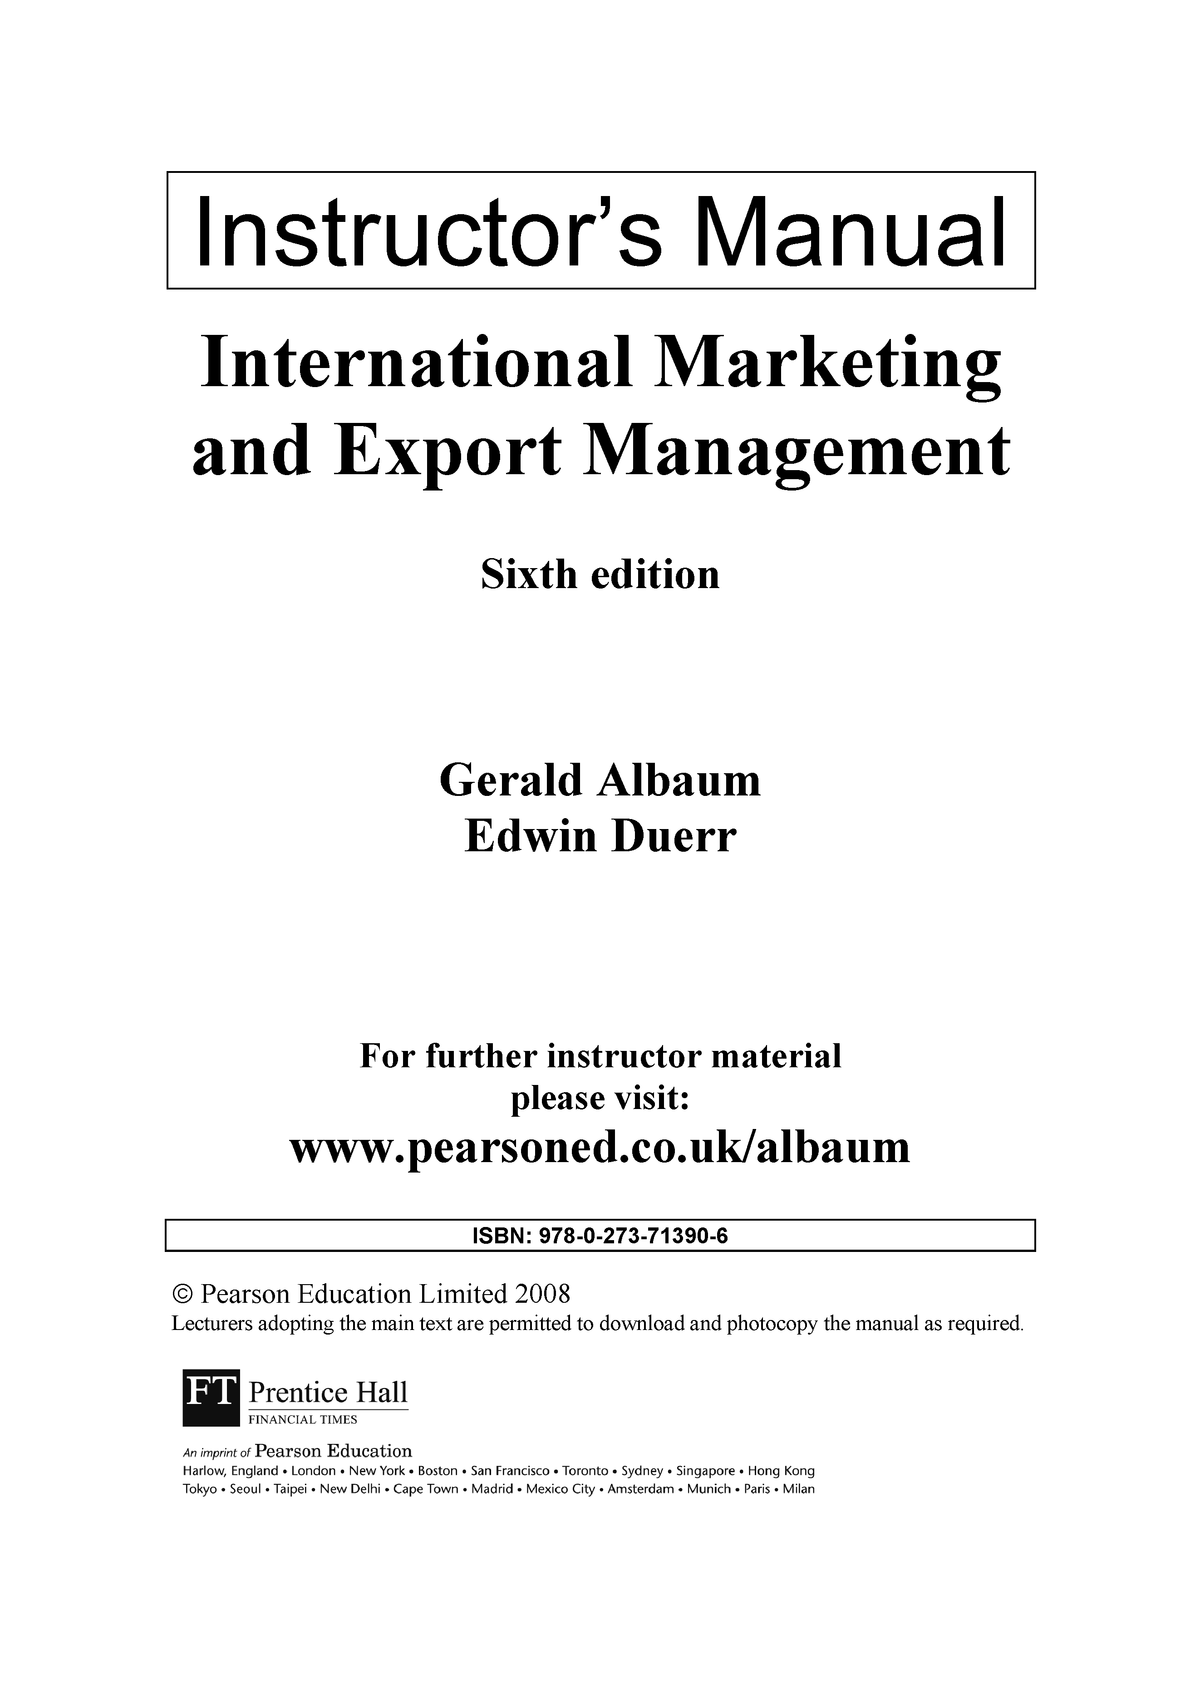 Marketing and export - INBS 347 - MSU - StuDocu